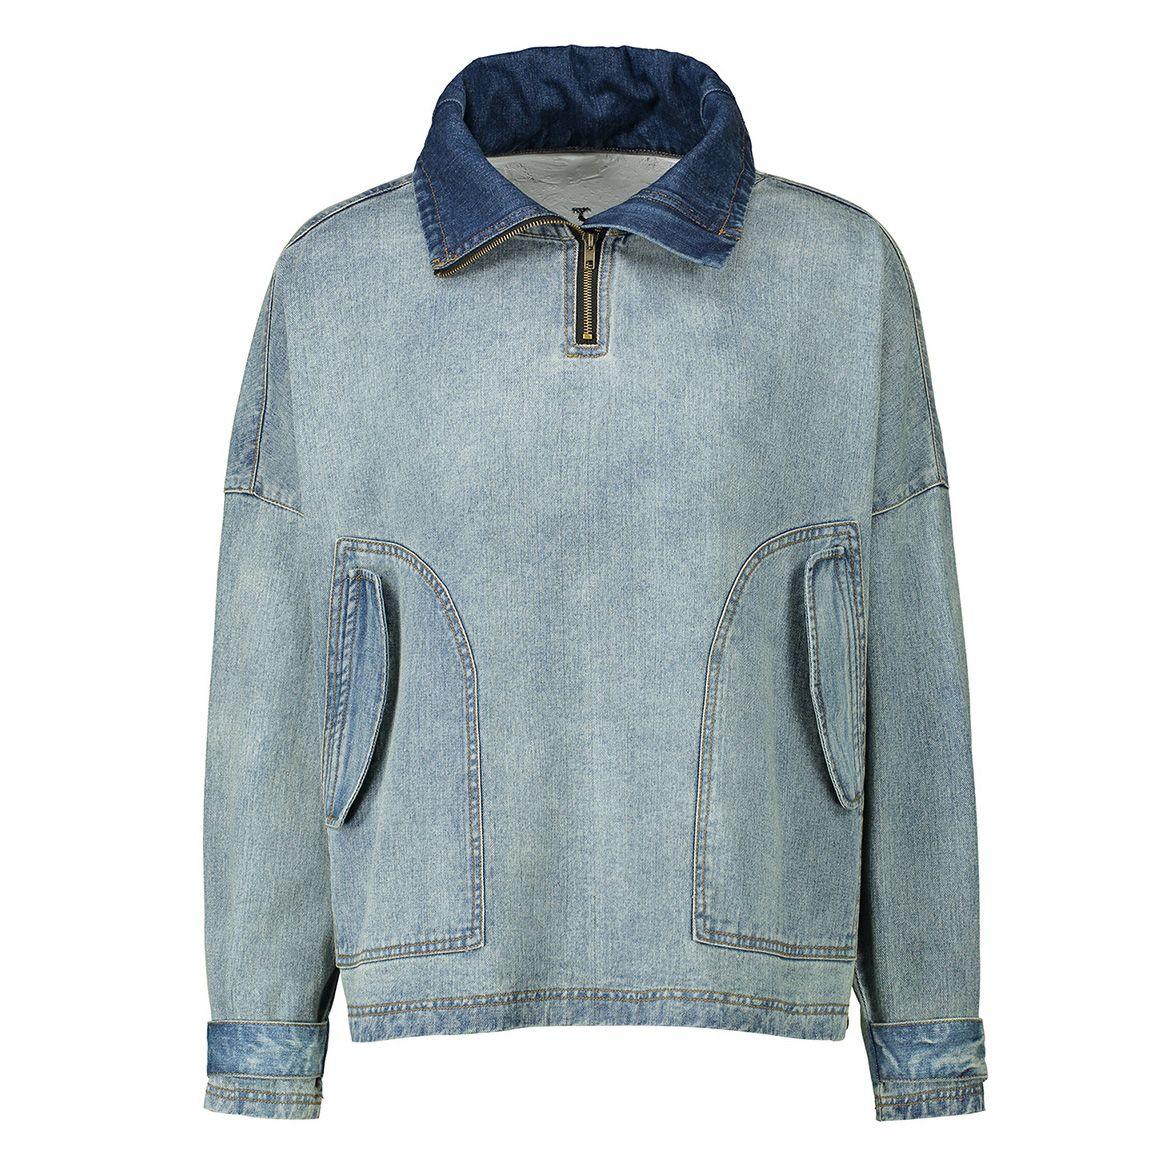 Mens Denim Jacket Europa Tide Marca Mens Colarinho alto do ombro solto Retro Jacket bolsos grandes 2020 Meninos Outono Casual Wear Top Quality